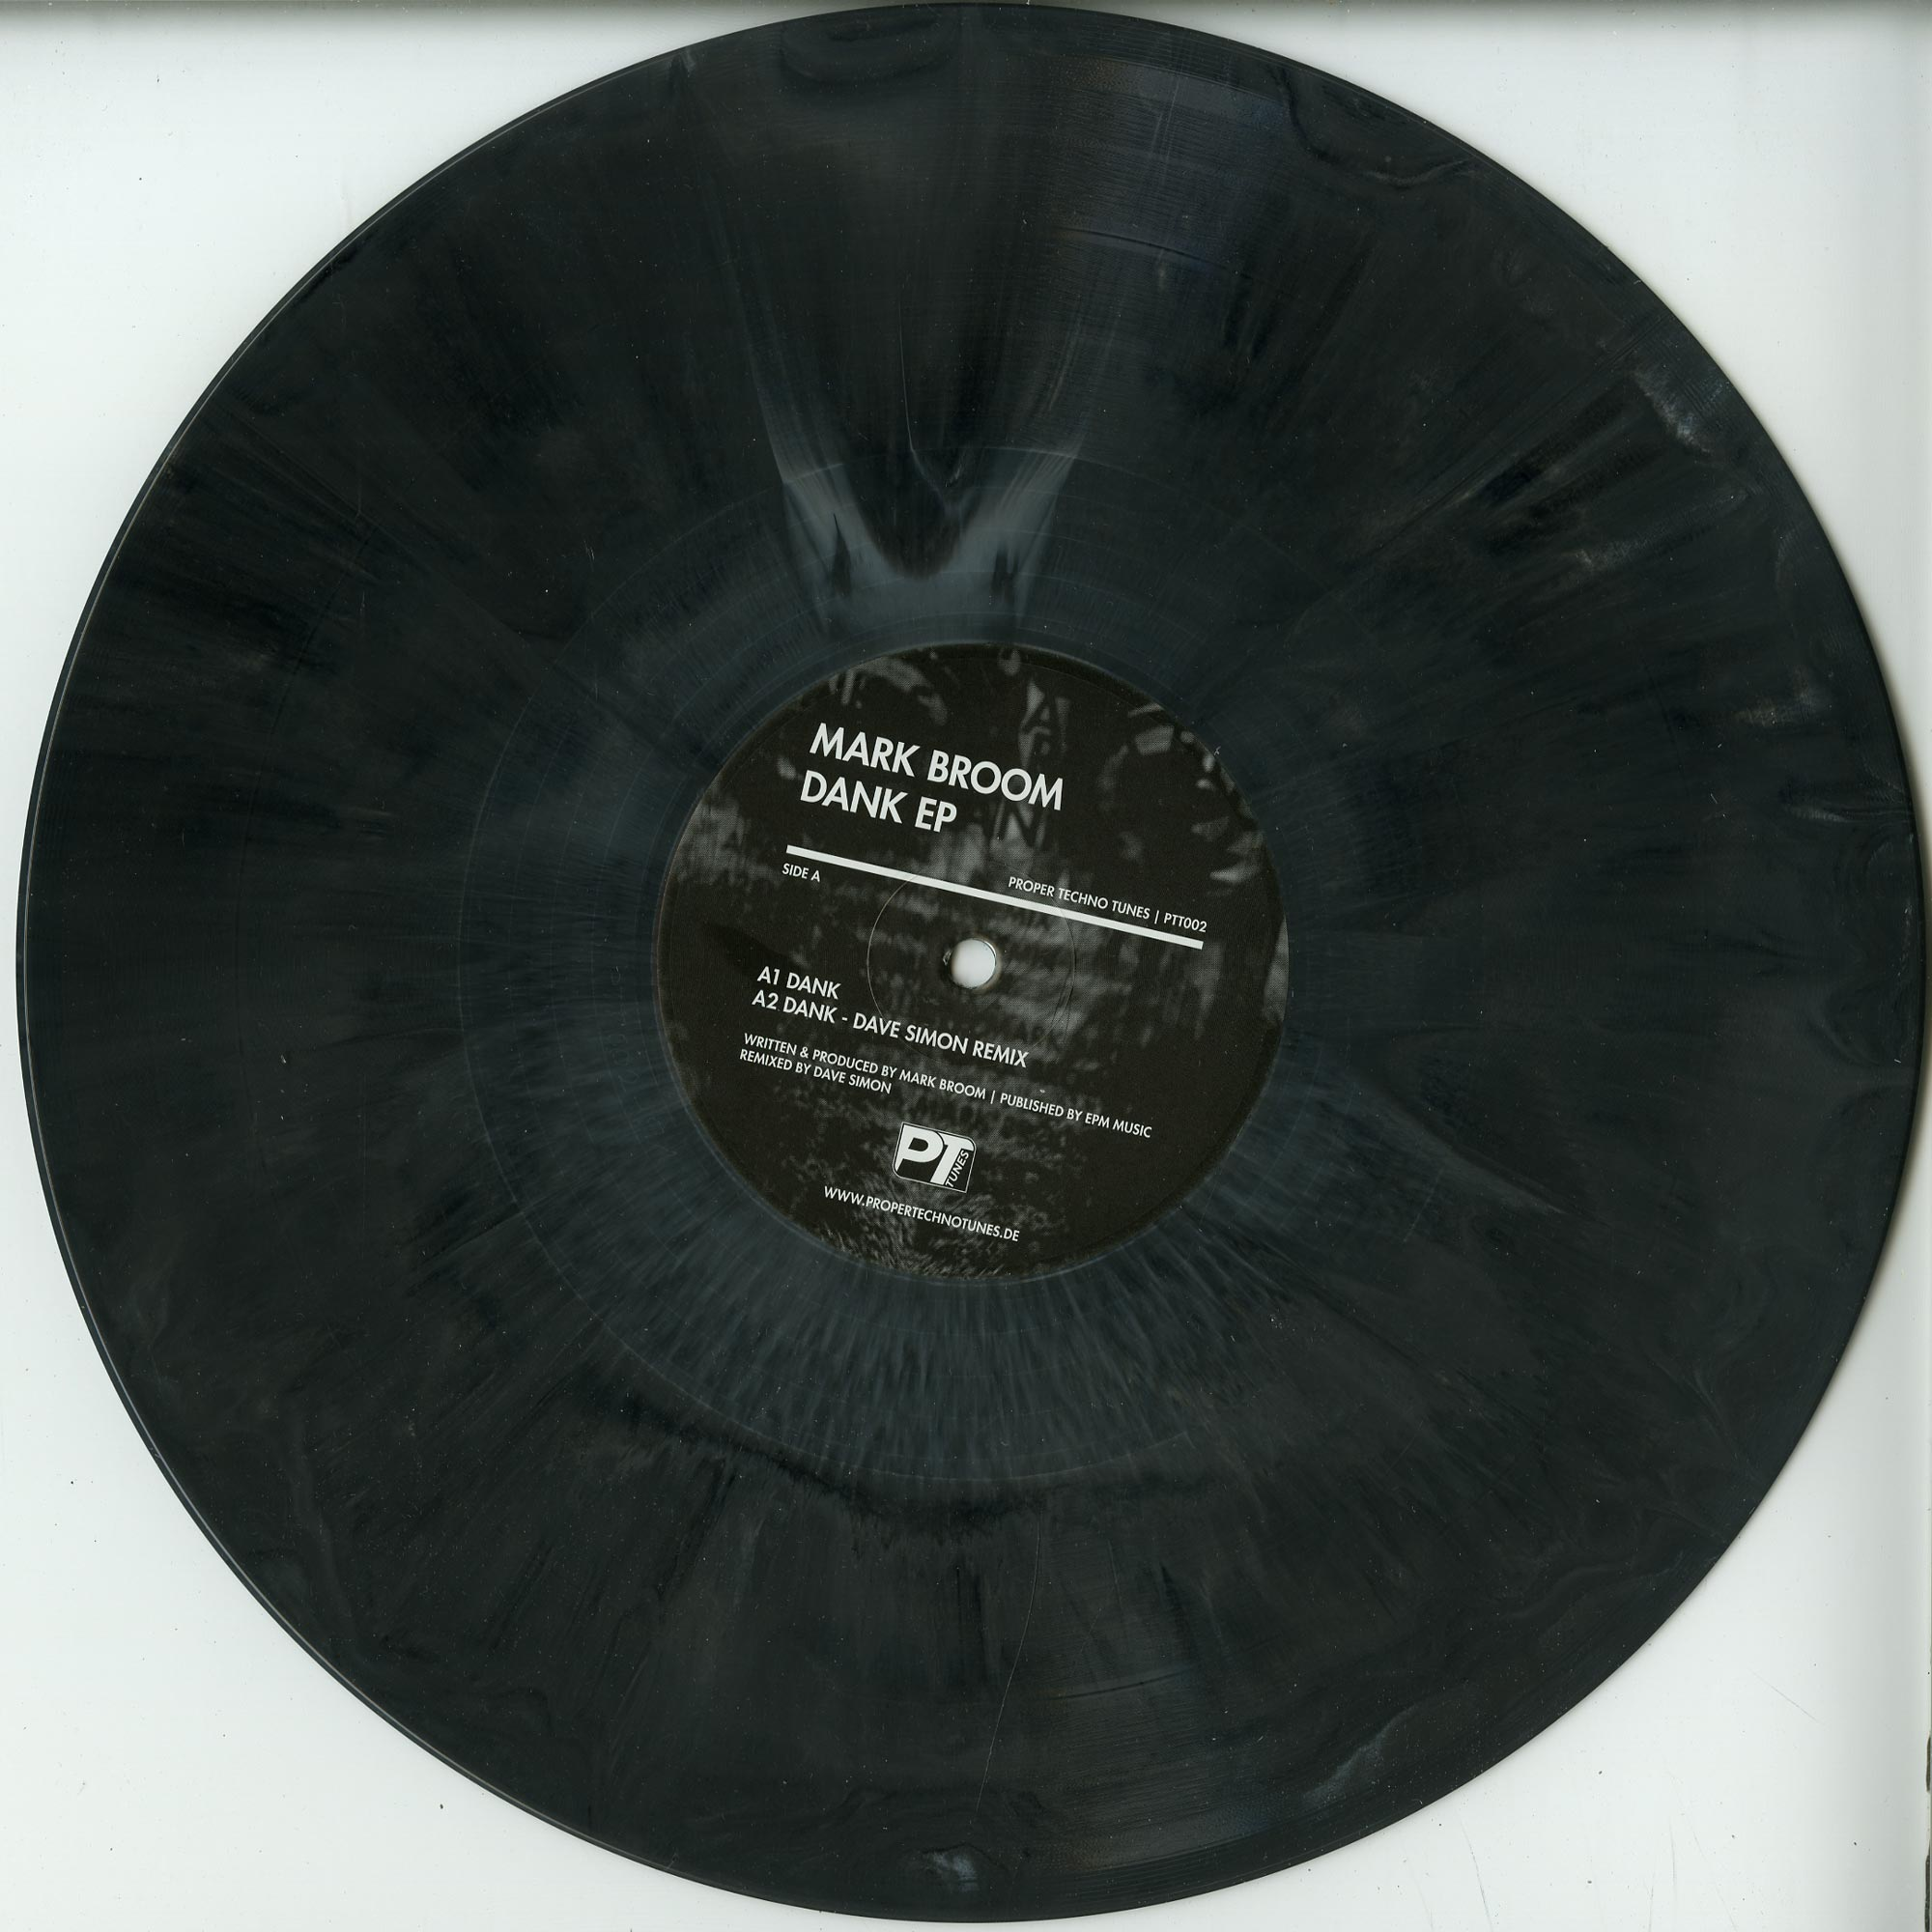 Mark Broom - DANK EP